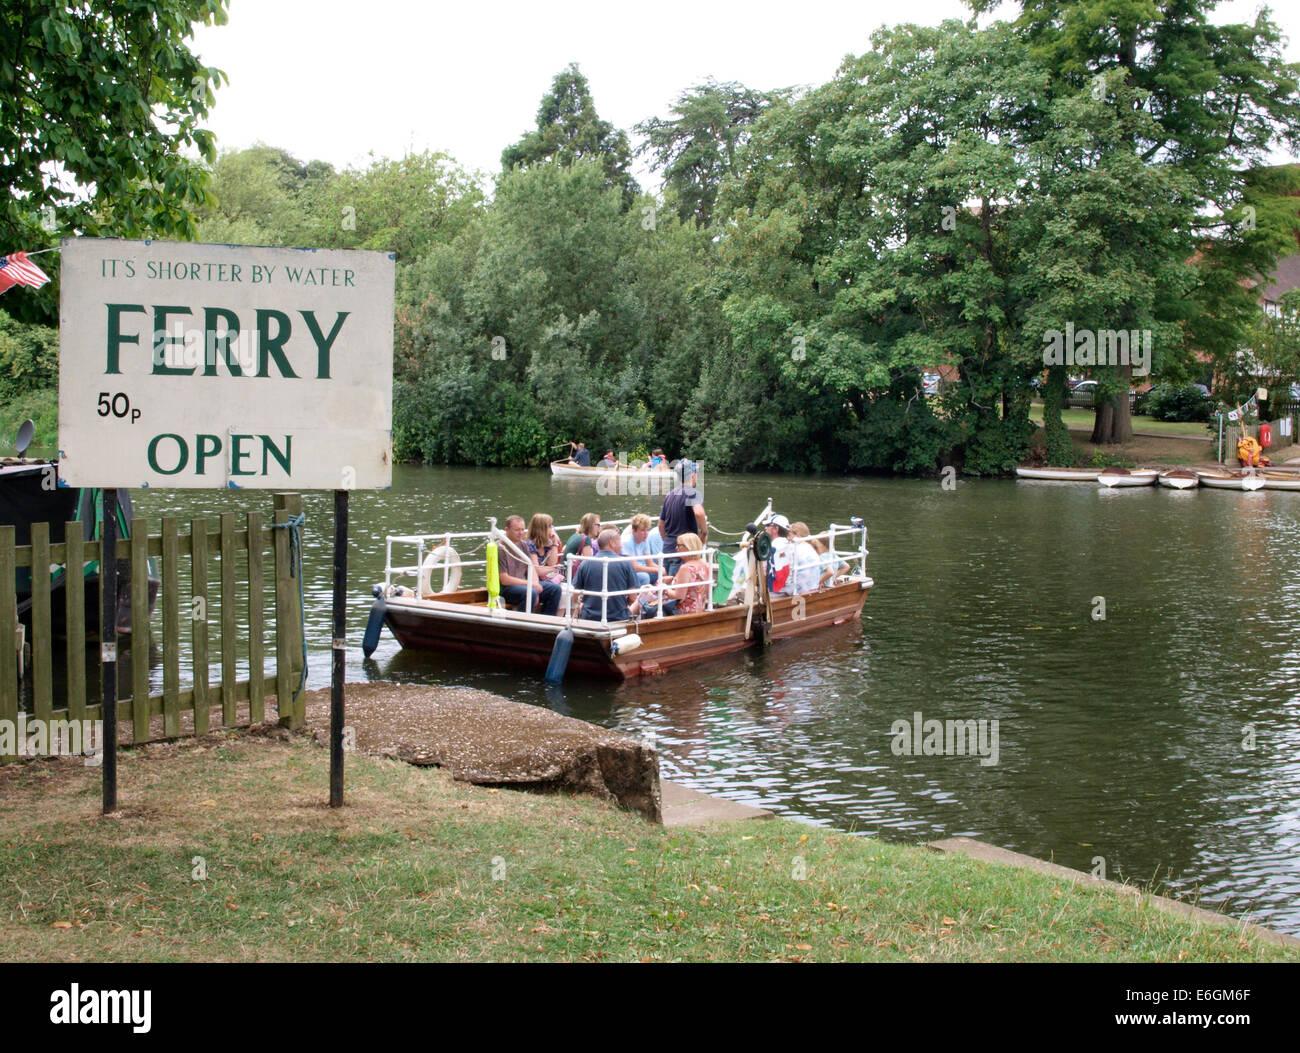 Chain Ferry, Stratford upon Avon, Warwickshire, UK - Stock Image